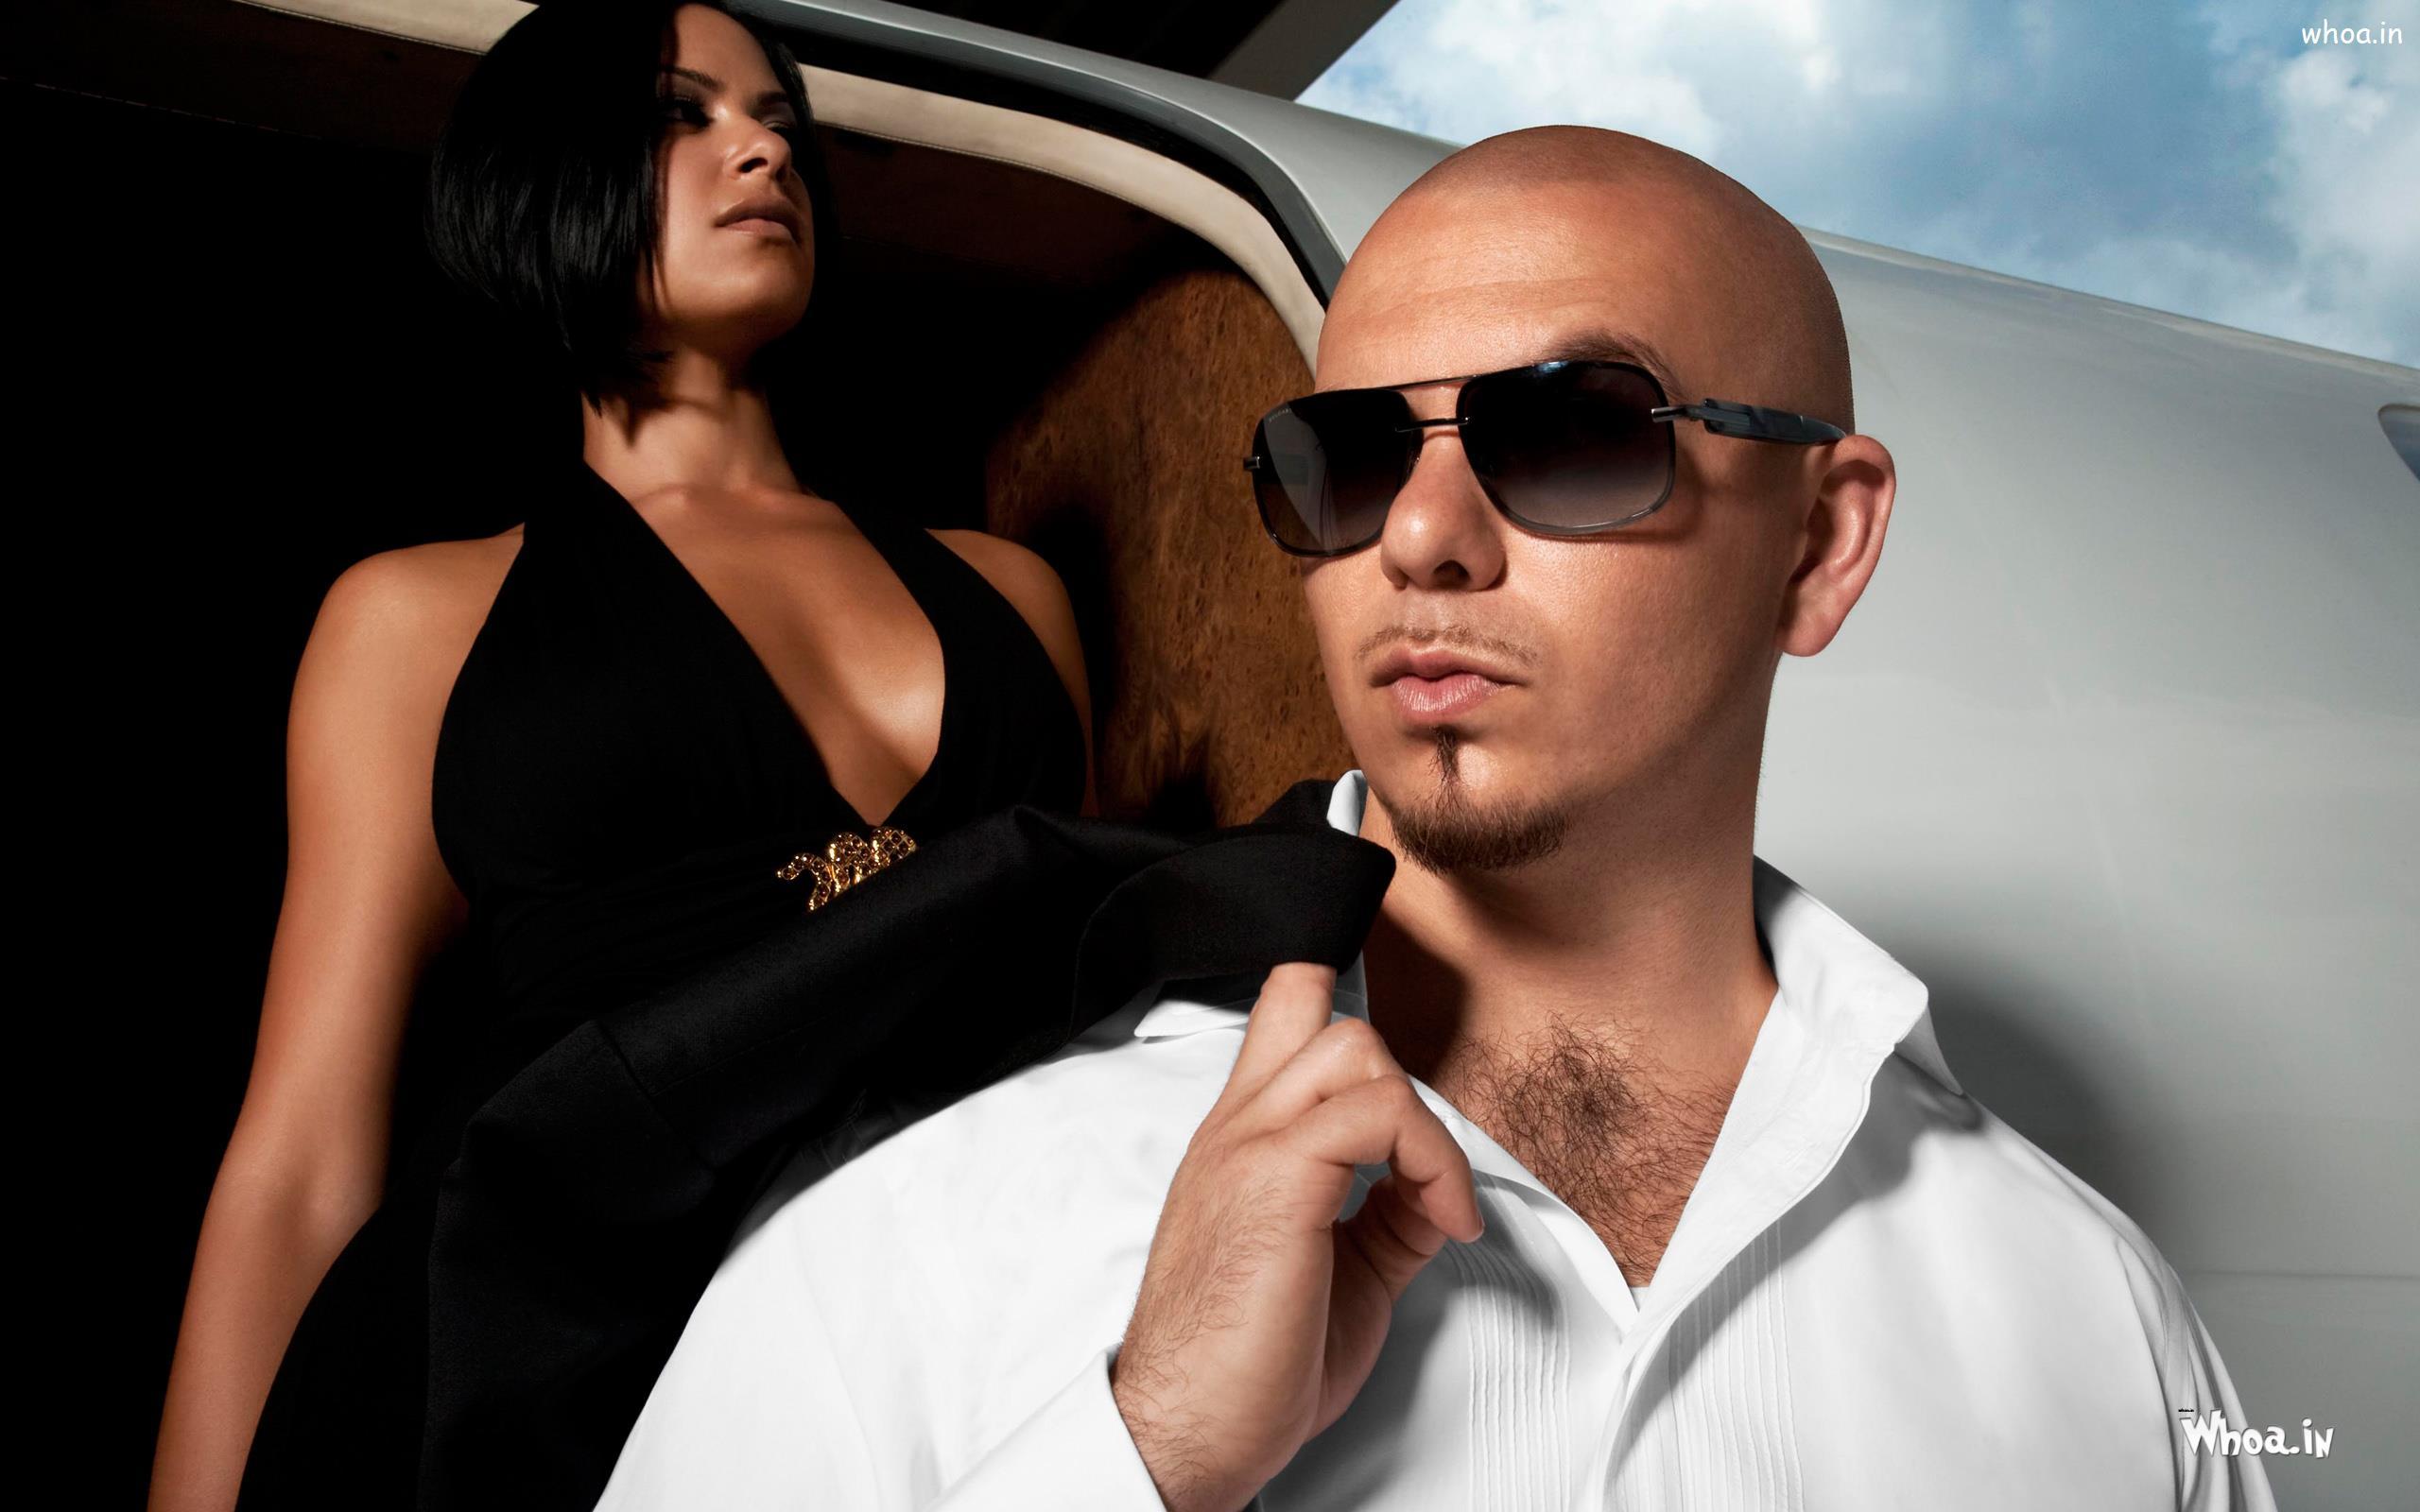 Pitbull White Suit And Black Sunglass HD Wallpaper